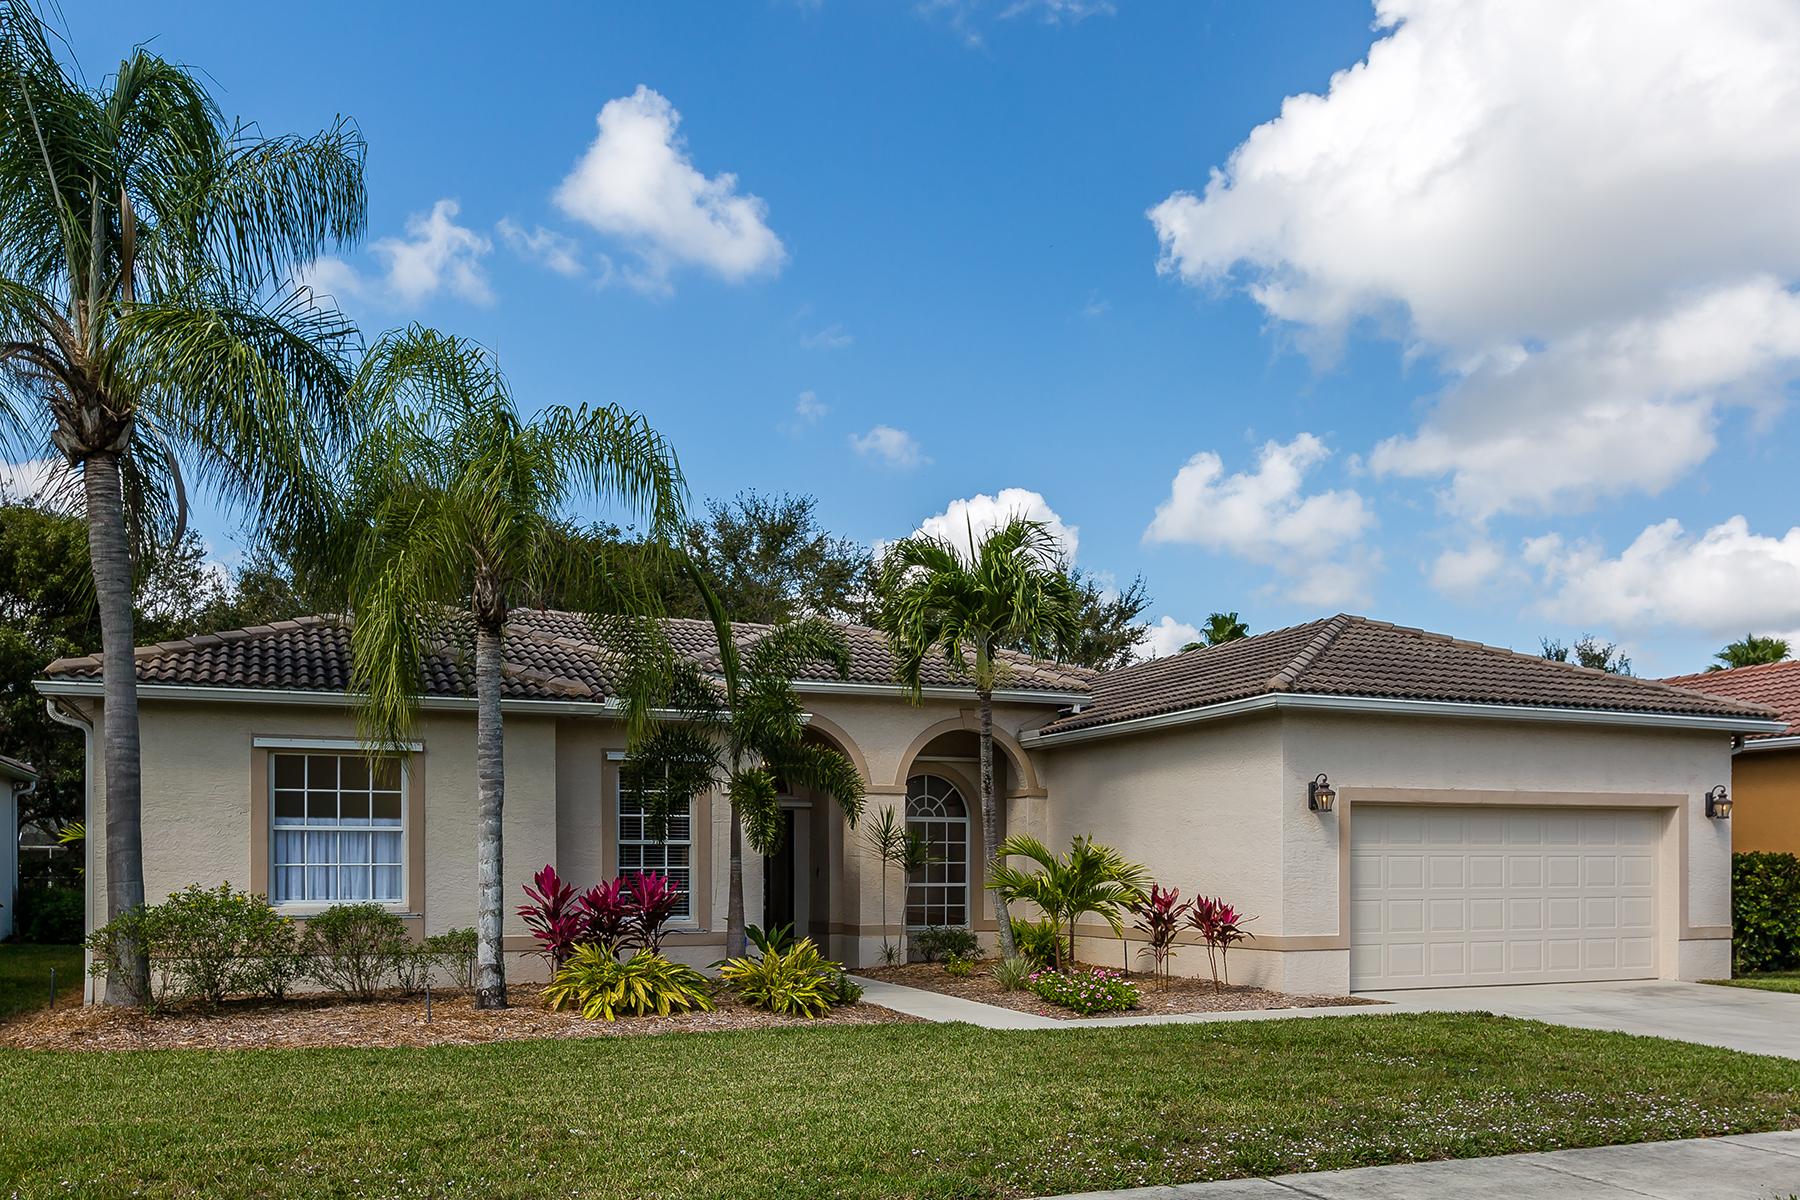 独户住宅 为 销售 在 LAUREL LAKES 8508 Laurel Lakes Blvd 那不勒斯, 佛罗里达州, 34119 美国